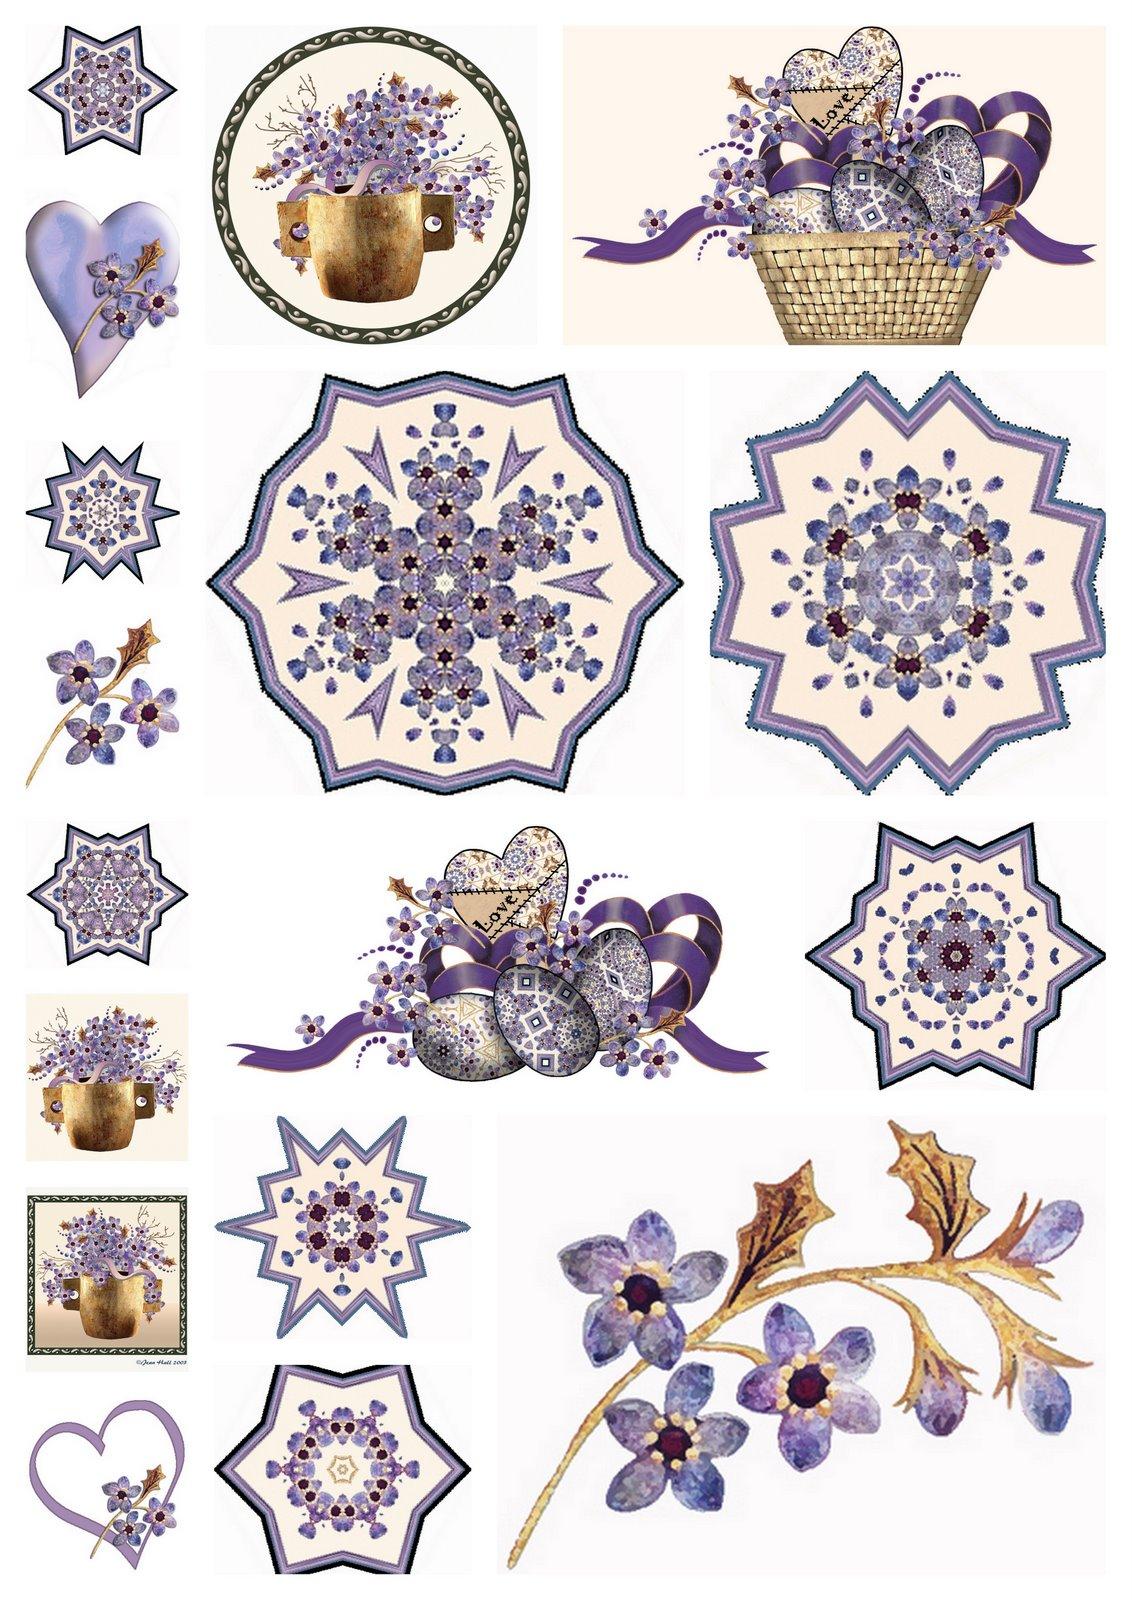 5 clipart scrapbook. Artbyjean paper crafts embellishments